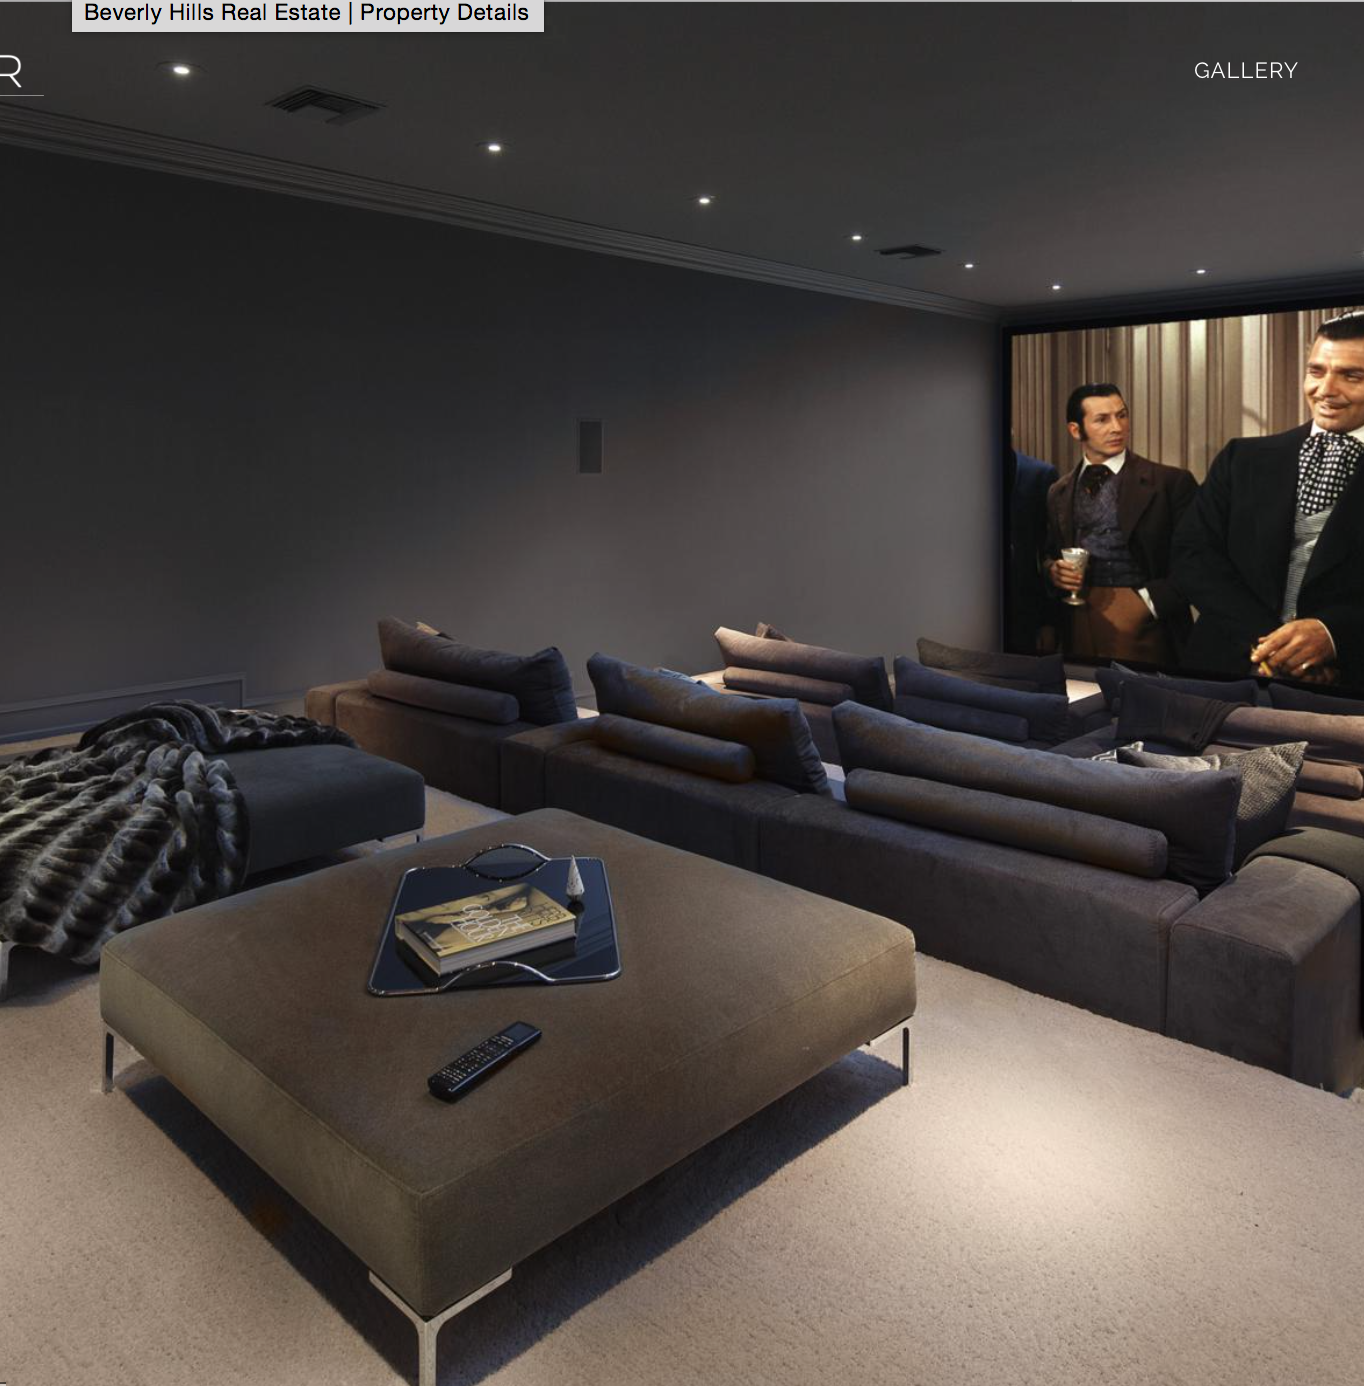 Home Cinema Room Home Theater: Home Theater Seating, Home Cinema